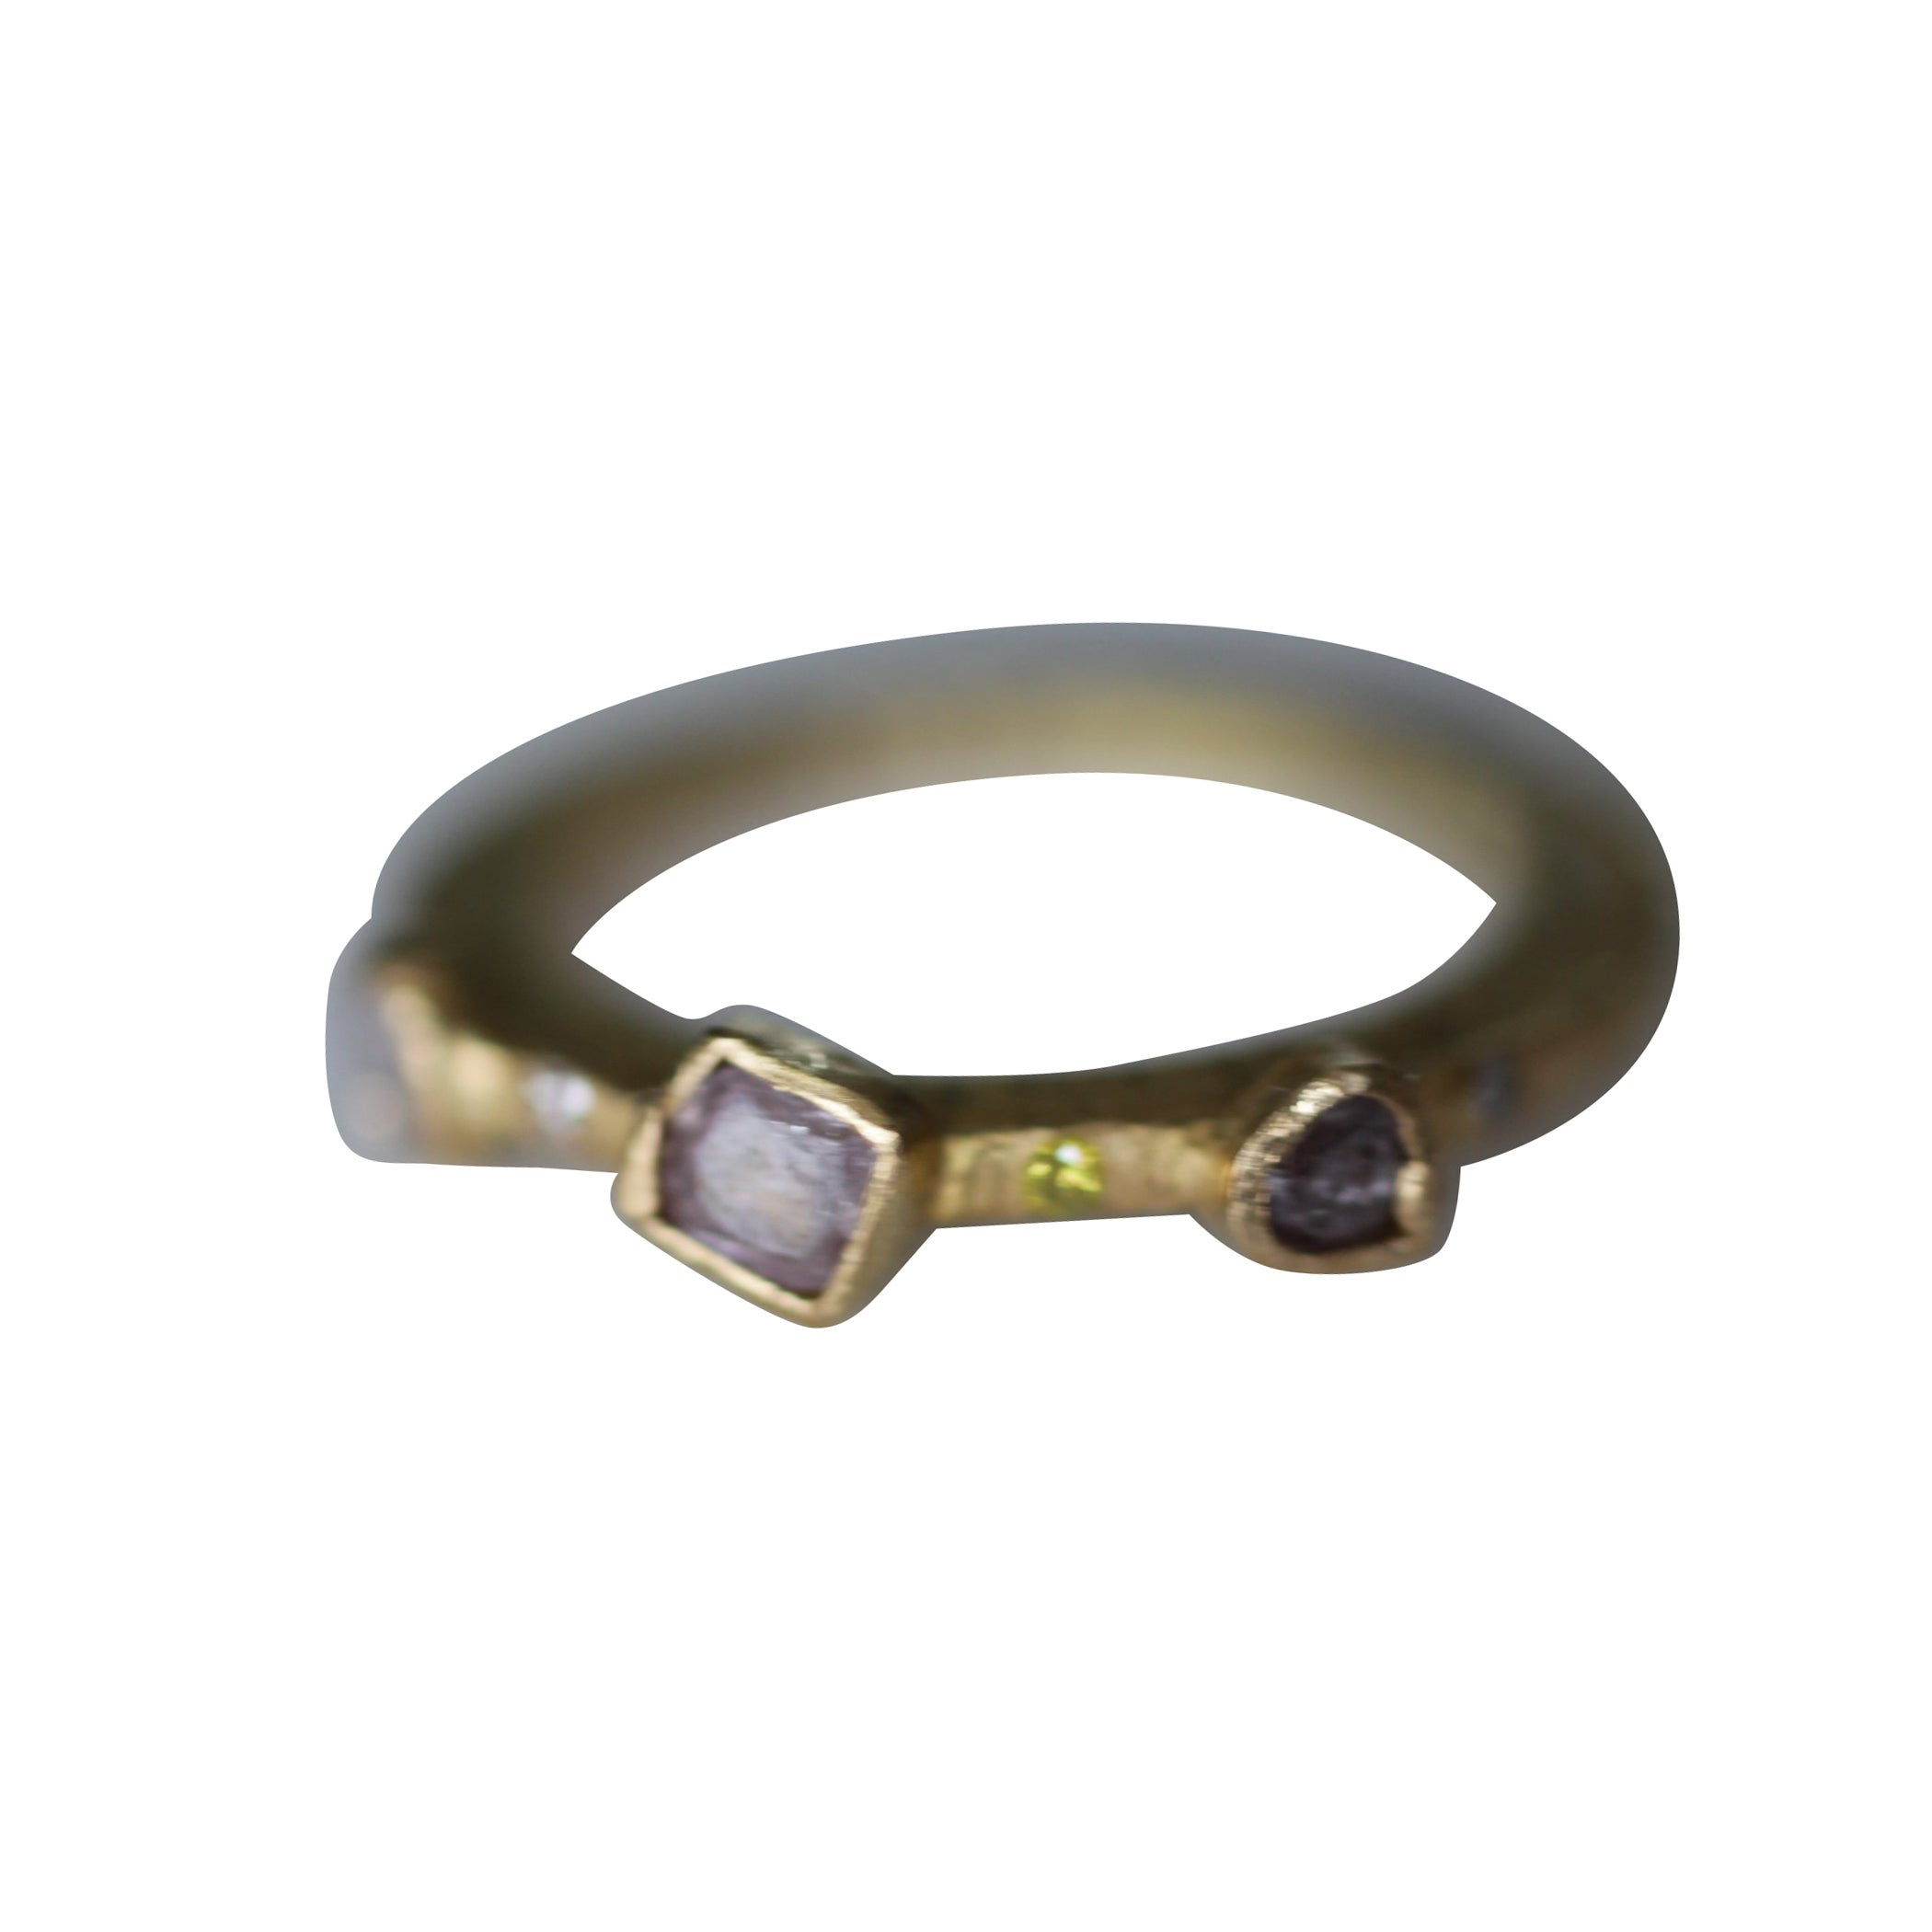 Color Diamond Tree-Stone Bezel Set in 22k Gold Engagement Bridal Ring Handmade